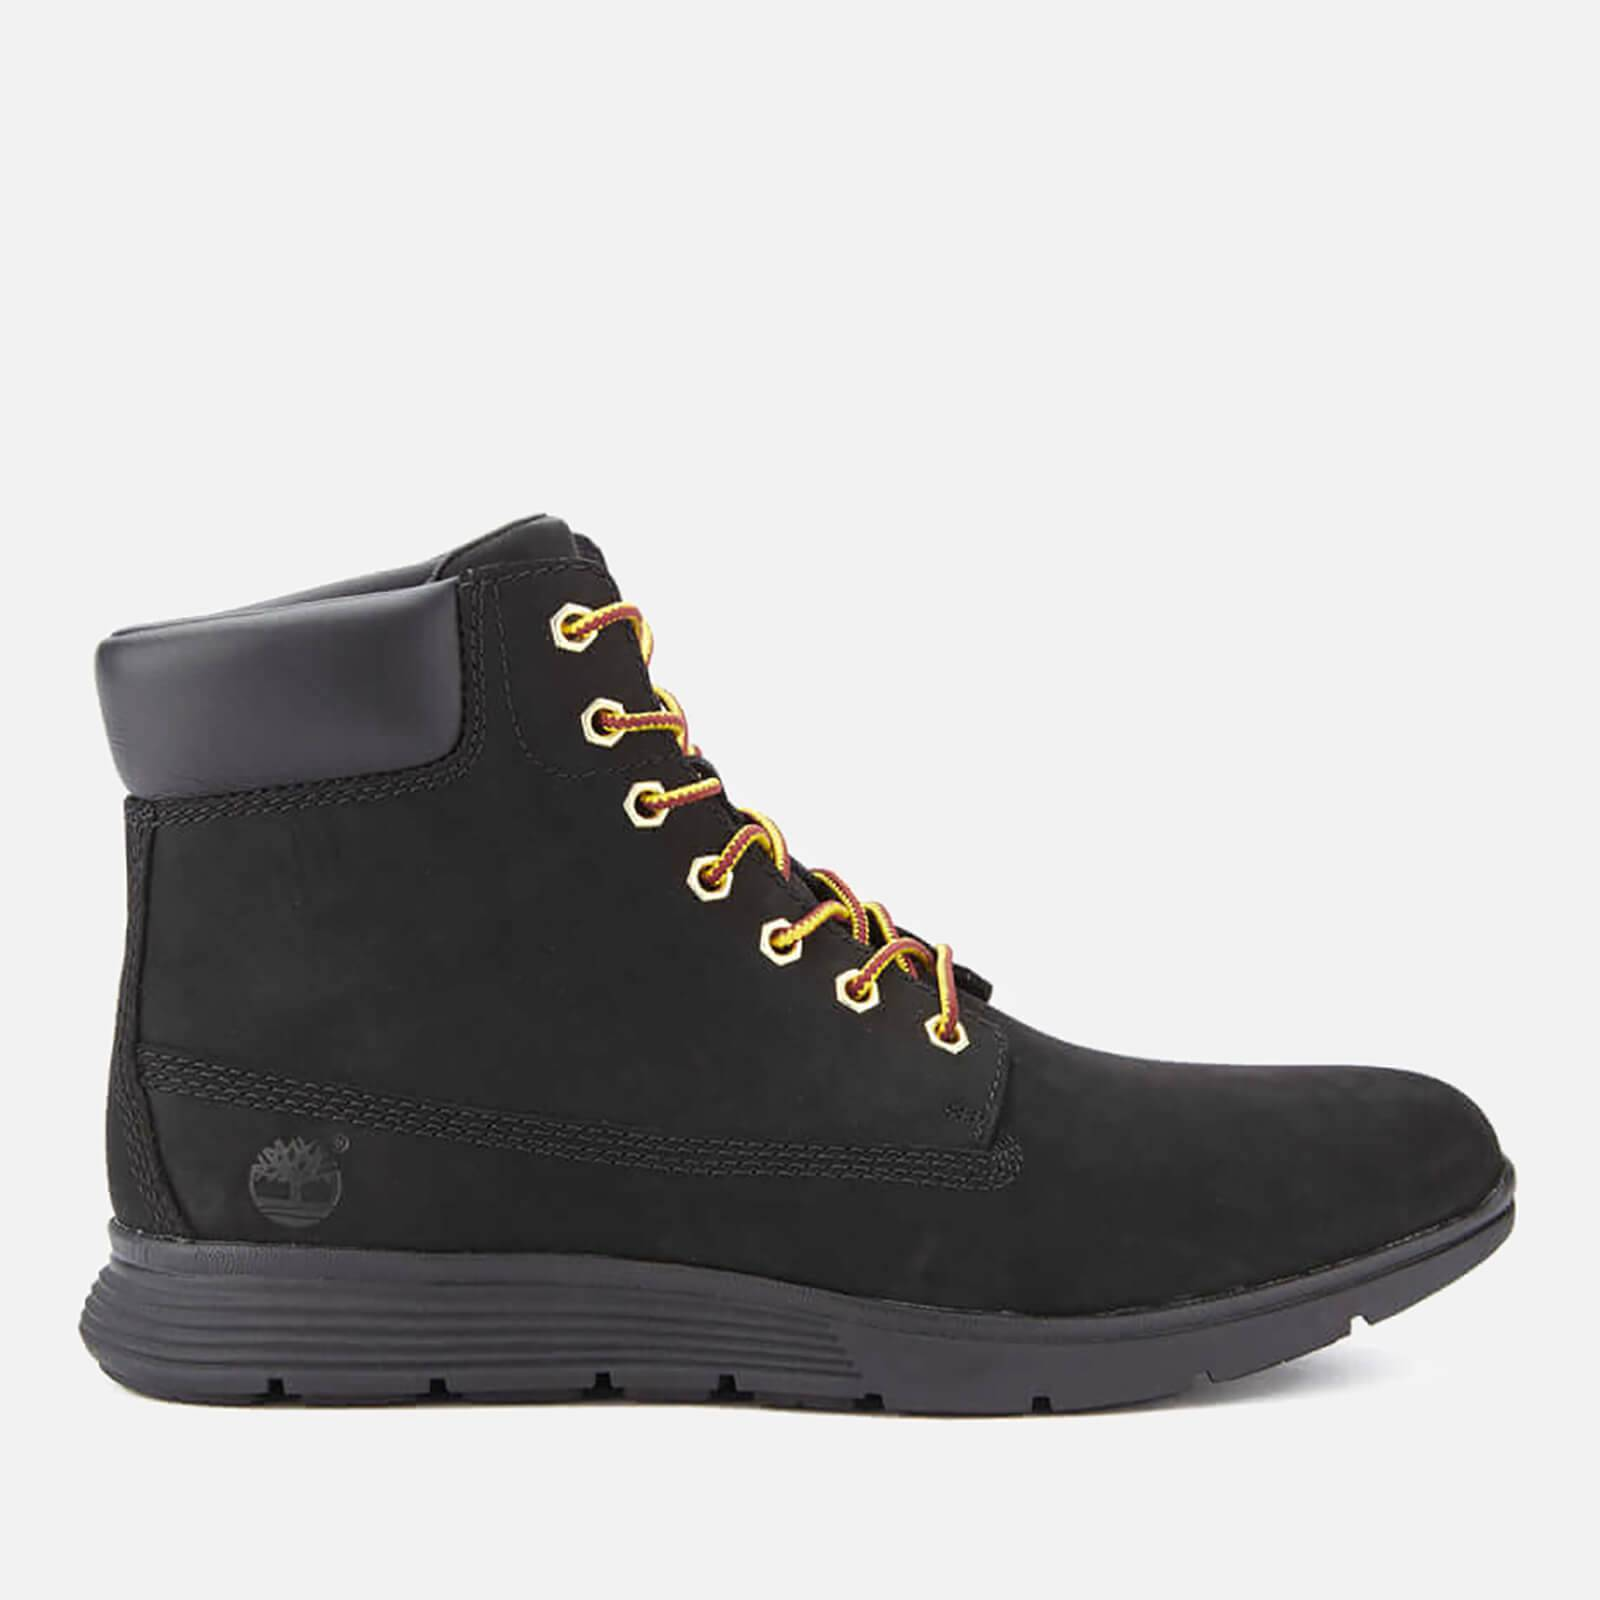 Timberland Men's Killington 6 Inch Boots - Black Nubuck - UK 9